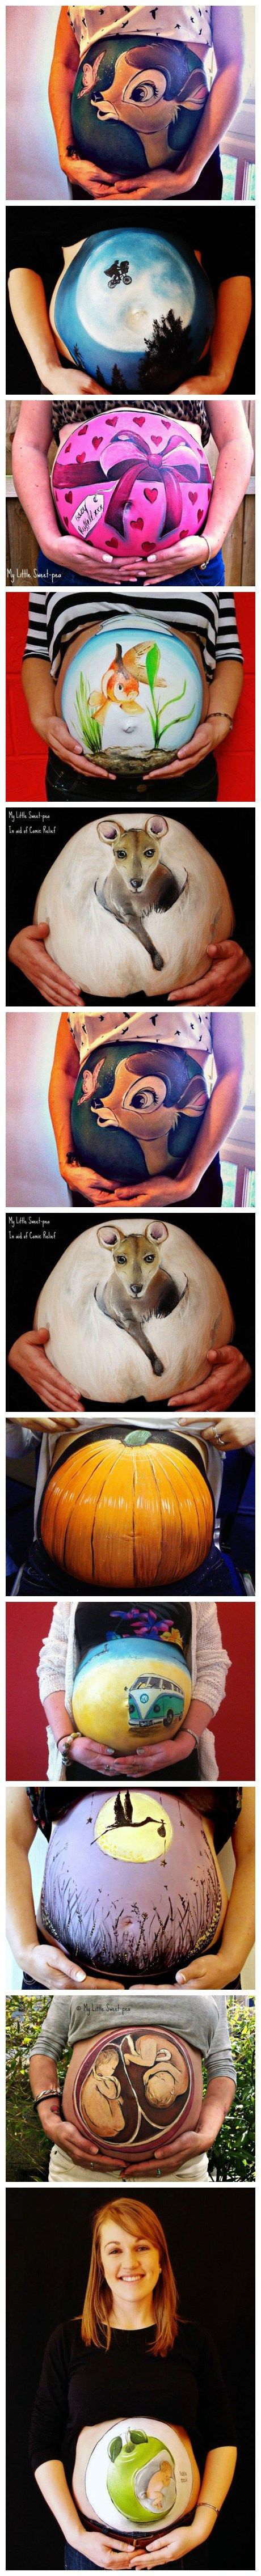 Bump Painting - Be Creative & Have Fun | DIY Tag